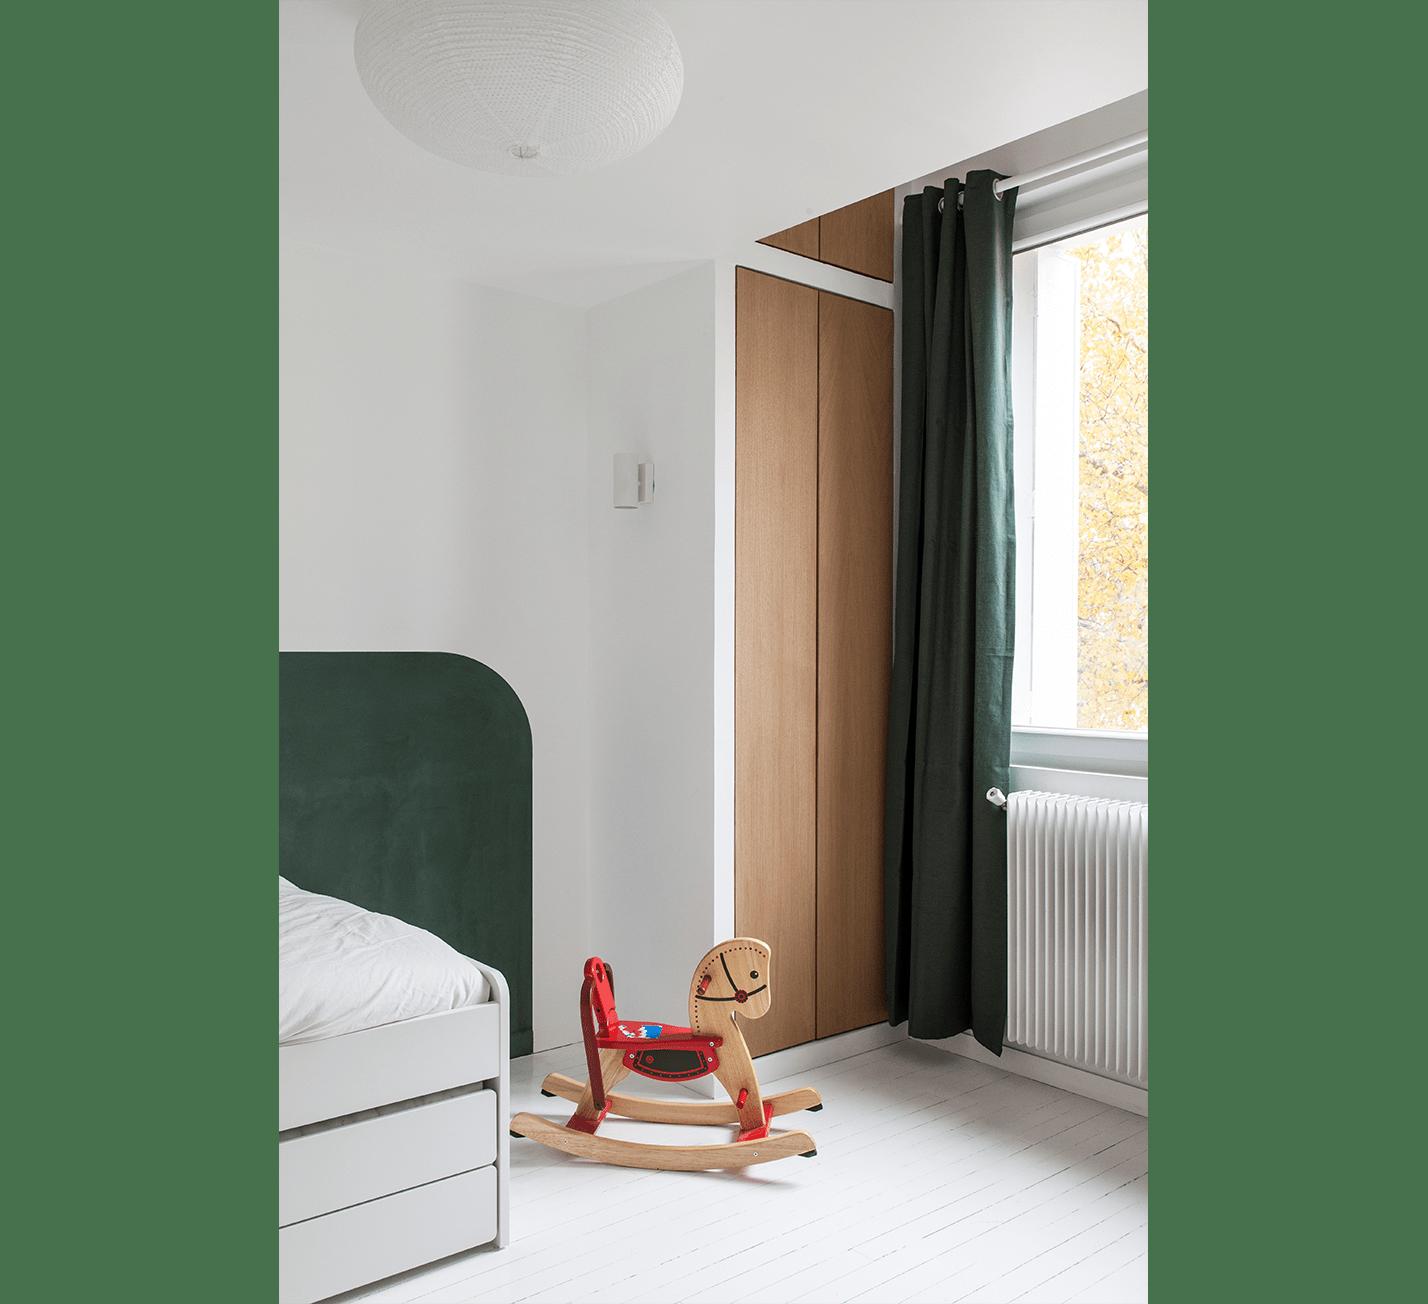 Projet-Germaine-Atelier-Steve-Pauline-Borgia-Architecte-interieur-06-min